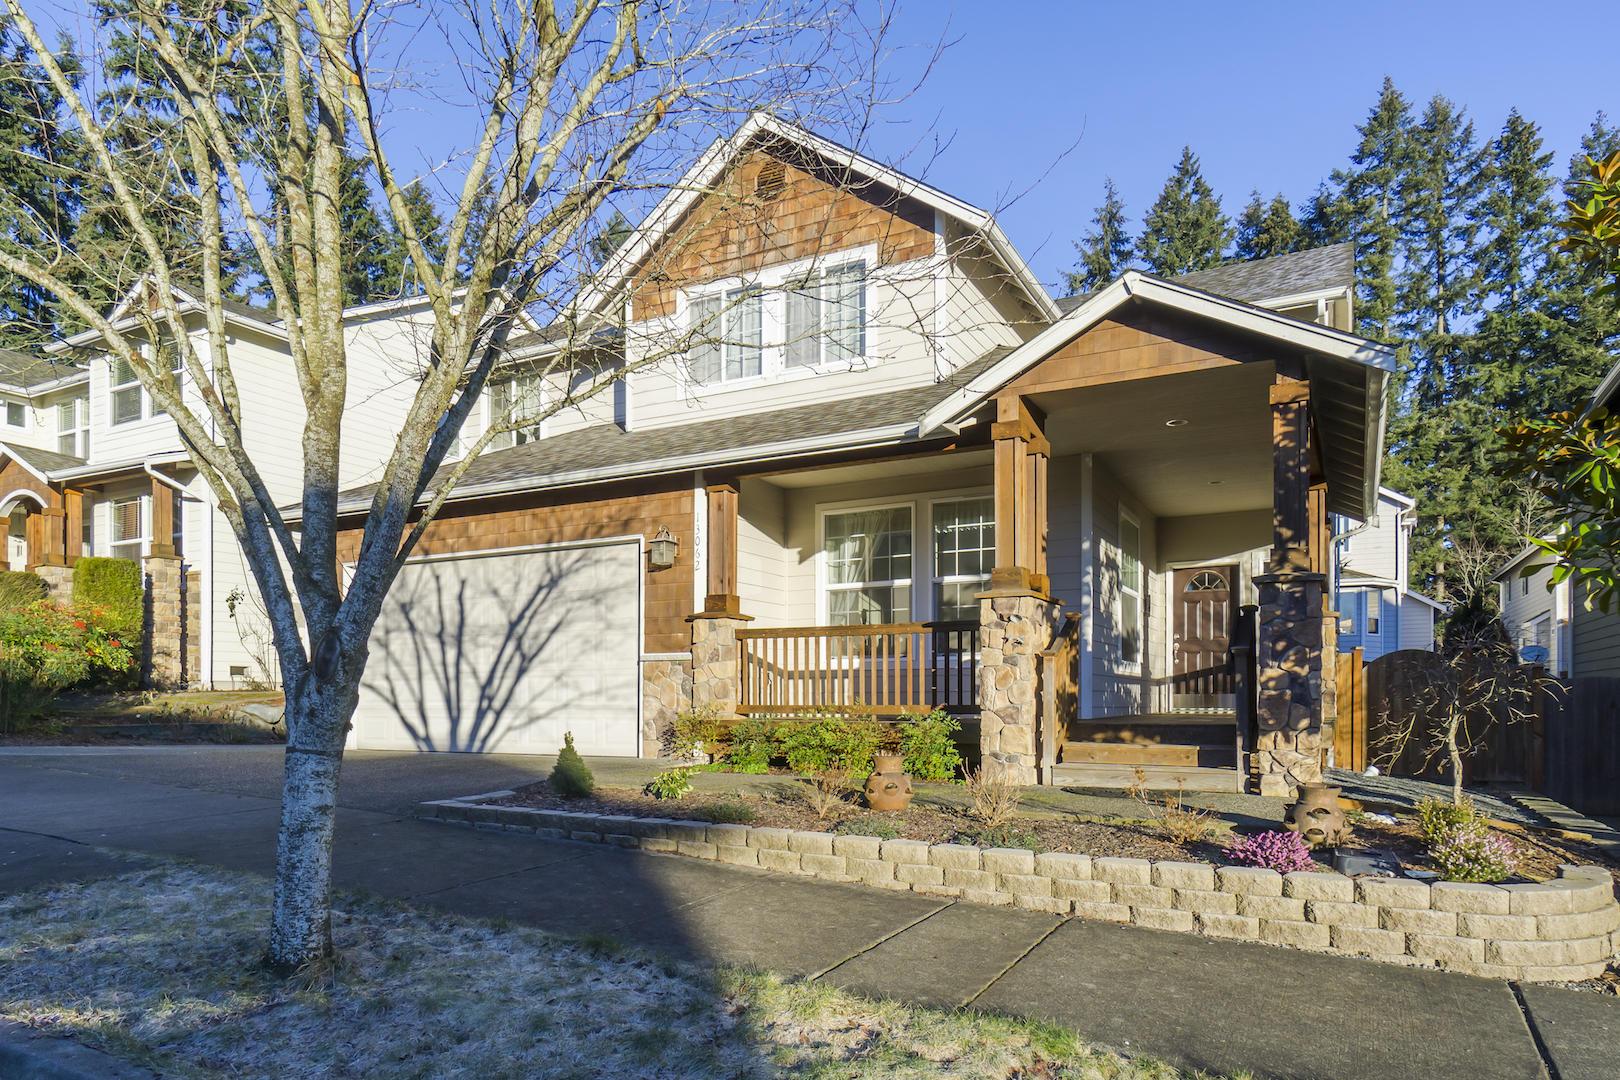 13062 ne 186th st woodinville wa 98072 estimate and home details